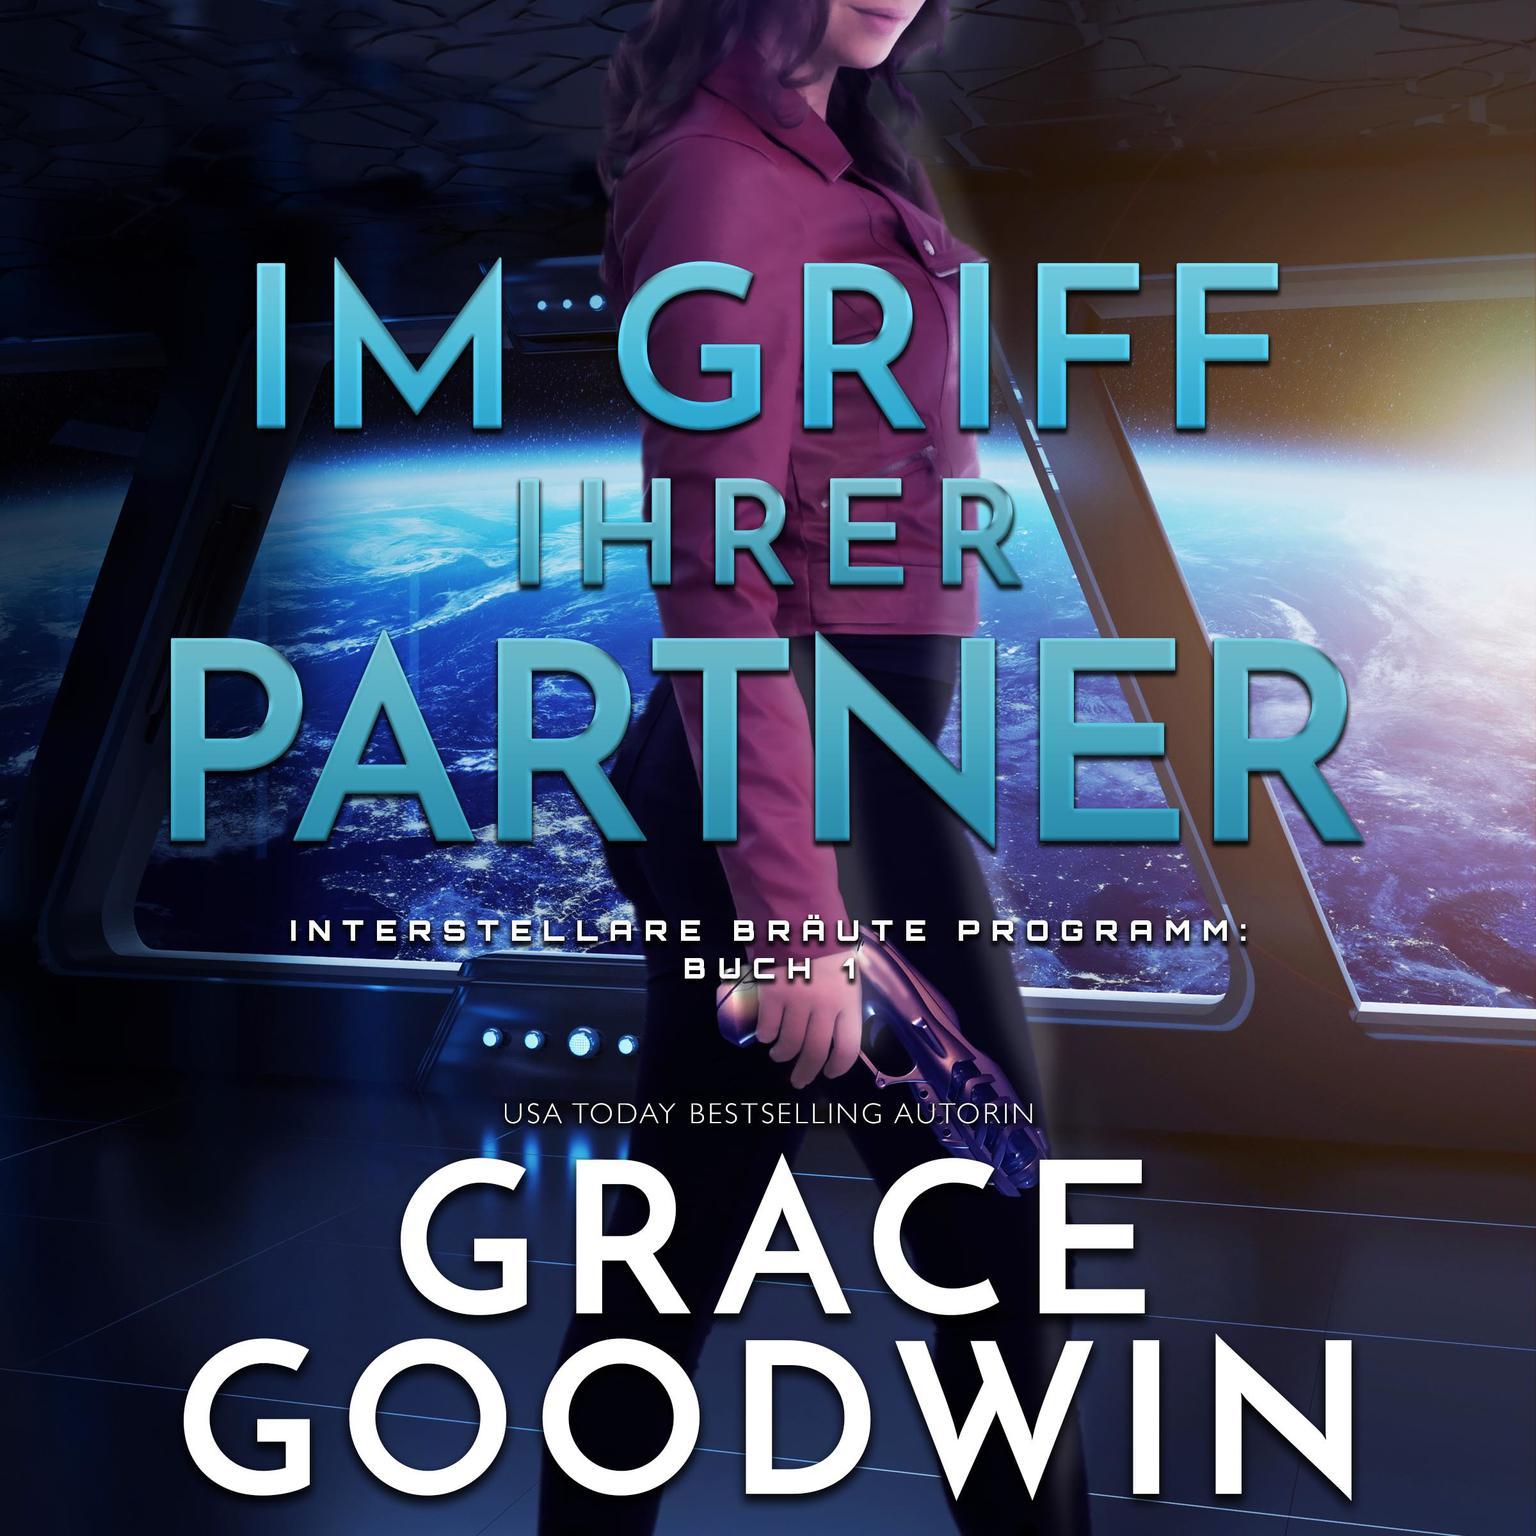 Im Griff ihrer Partner Audiobook, by Grace Goodwin